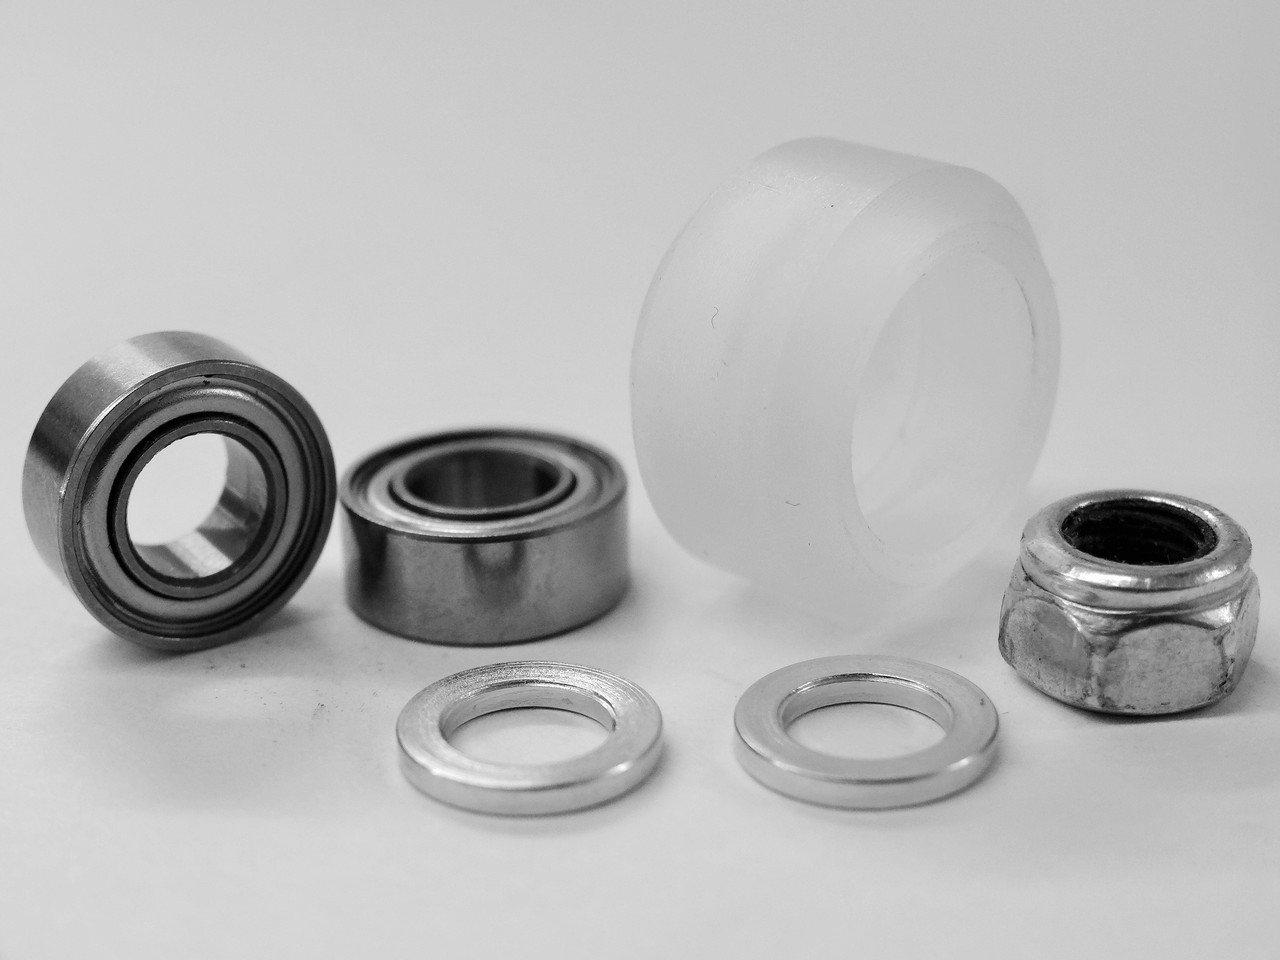 OpenBuilds Xtreme Mini V Wheel Kit (20 Pack) by OpenBuilds (Image #1)